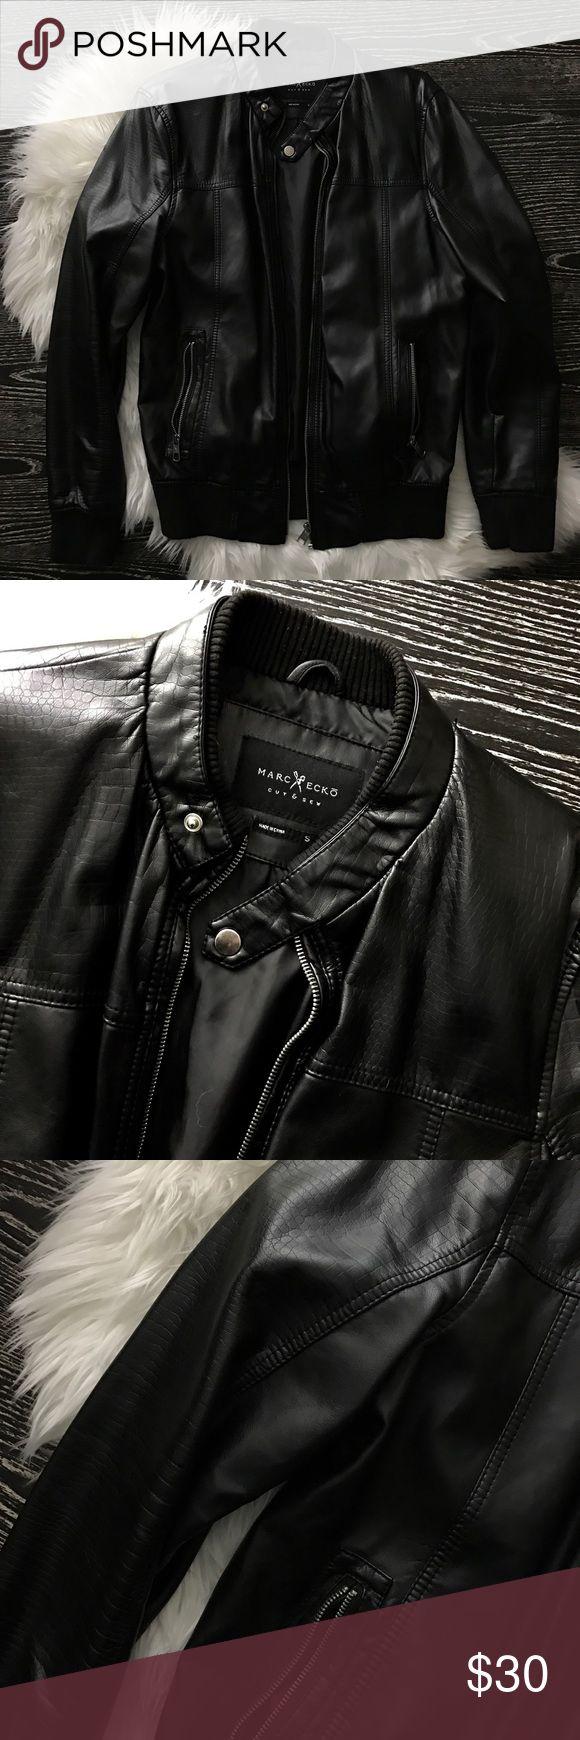 Marc Ecko Black Faux Leather Jacket Small Worn twice / like new / marc ecko / black faux leather jacket / small Marc Ecko Jackets & Coats Bomber & Varsity